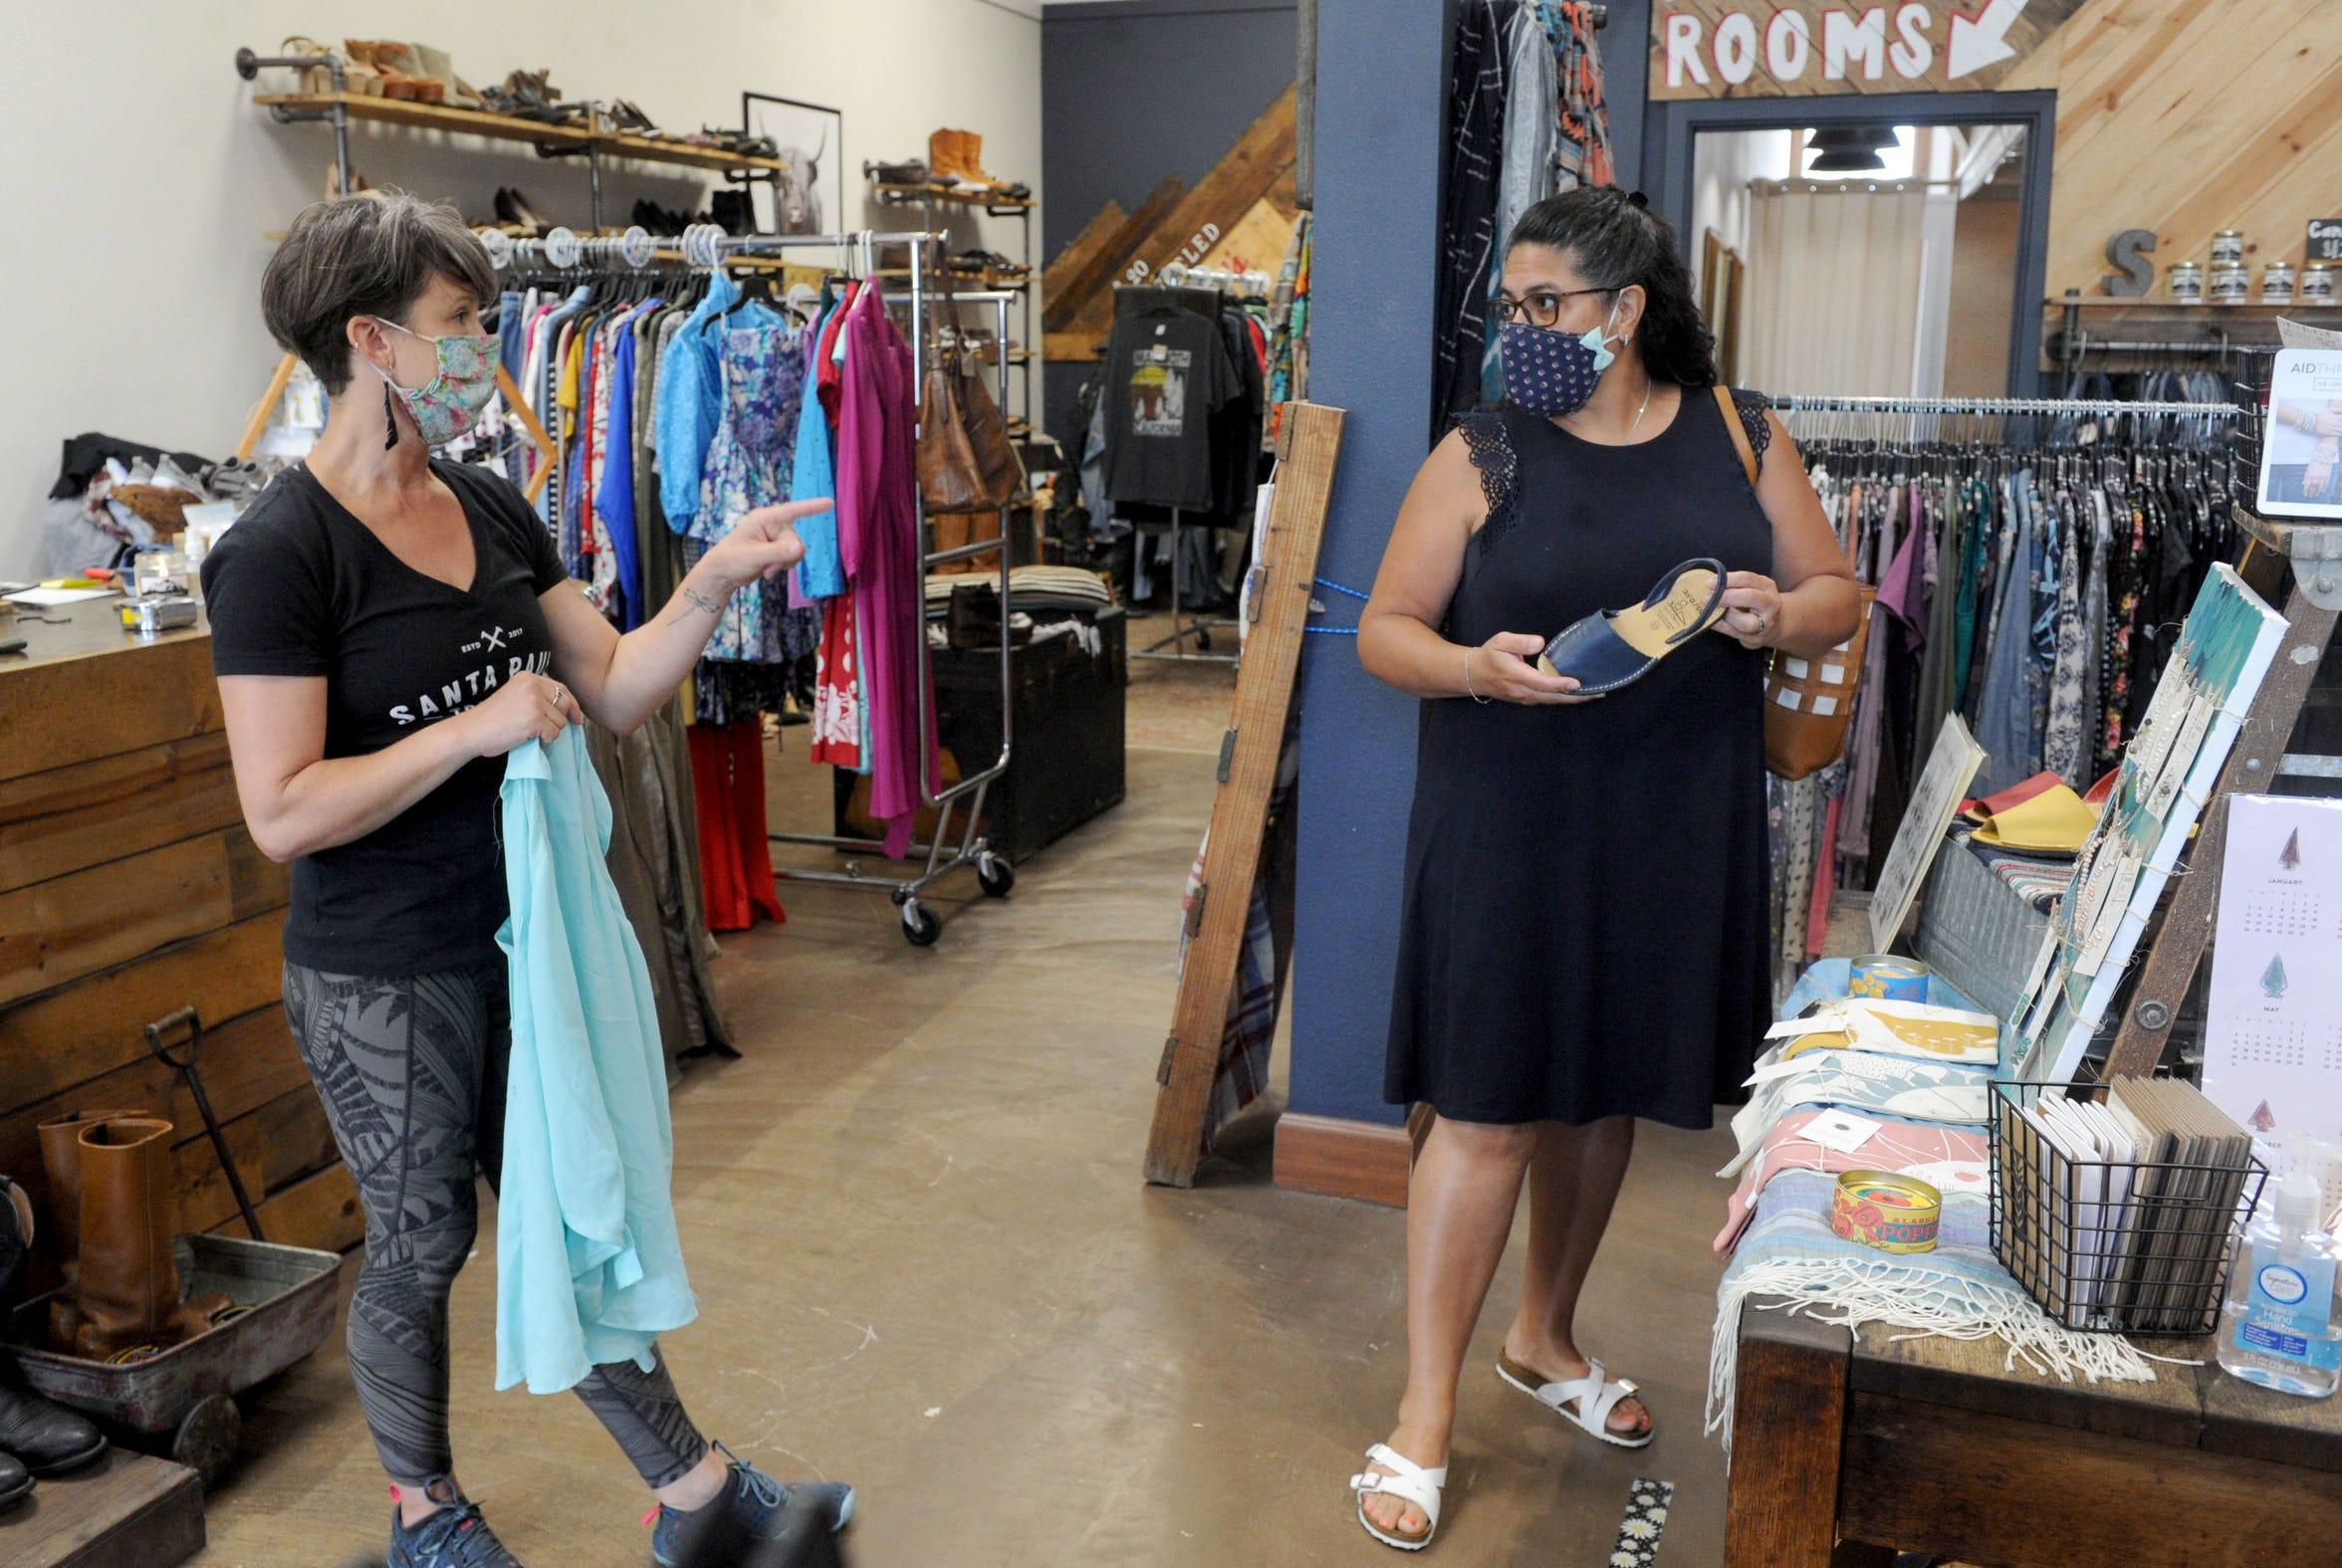 Tracy Hanna, left, owner of Santa Paula Trading Co in Santa Paula helps Yvette Enriquez, of Santa Clarita, on Tuesday, June 2, 2020.